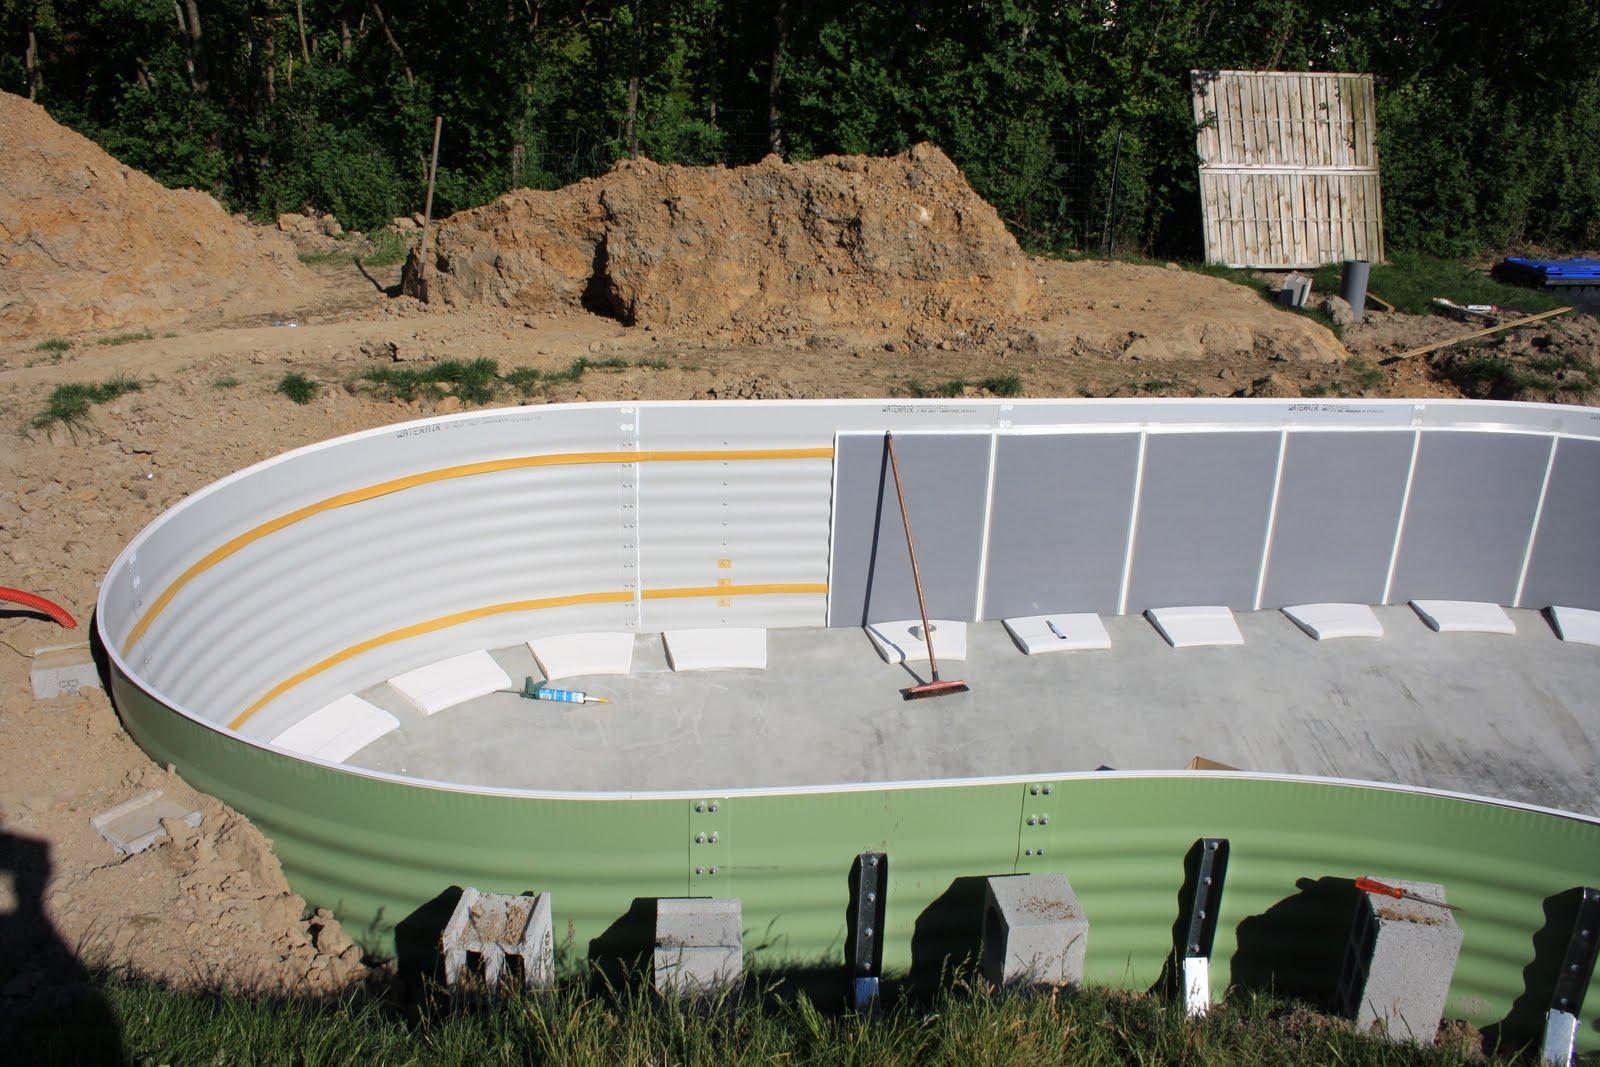 Montage piscine waterair for Piscine waterair